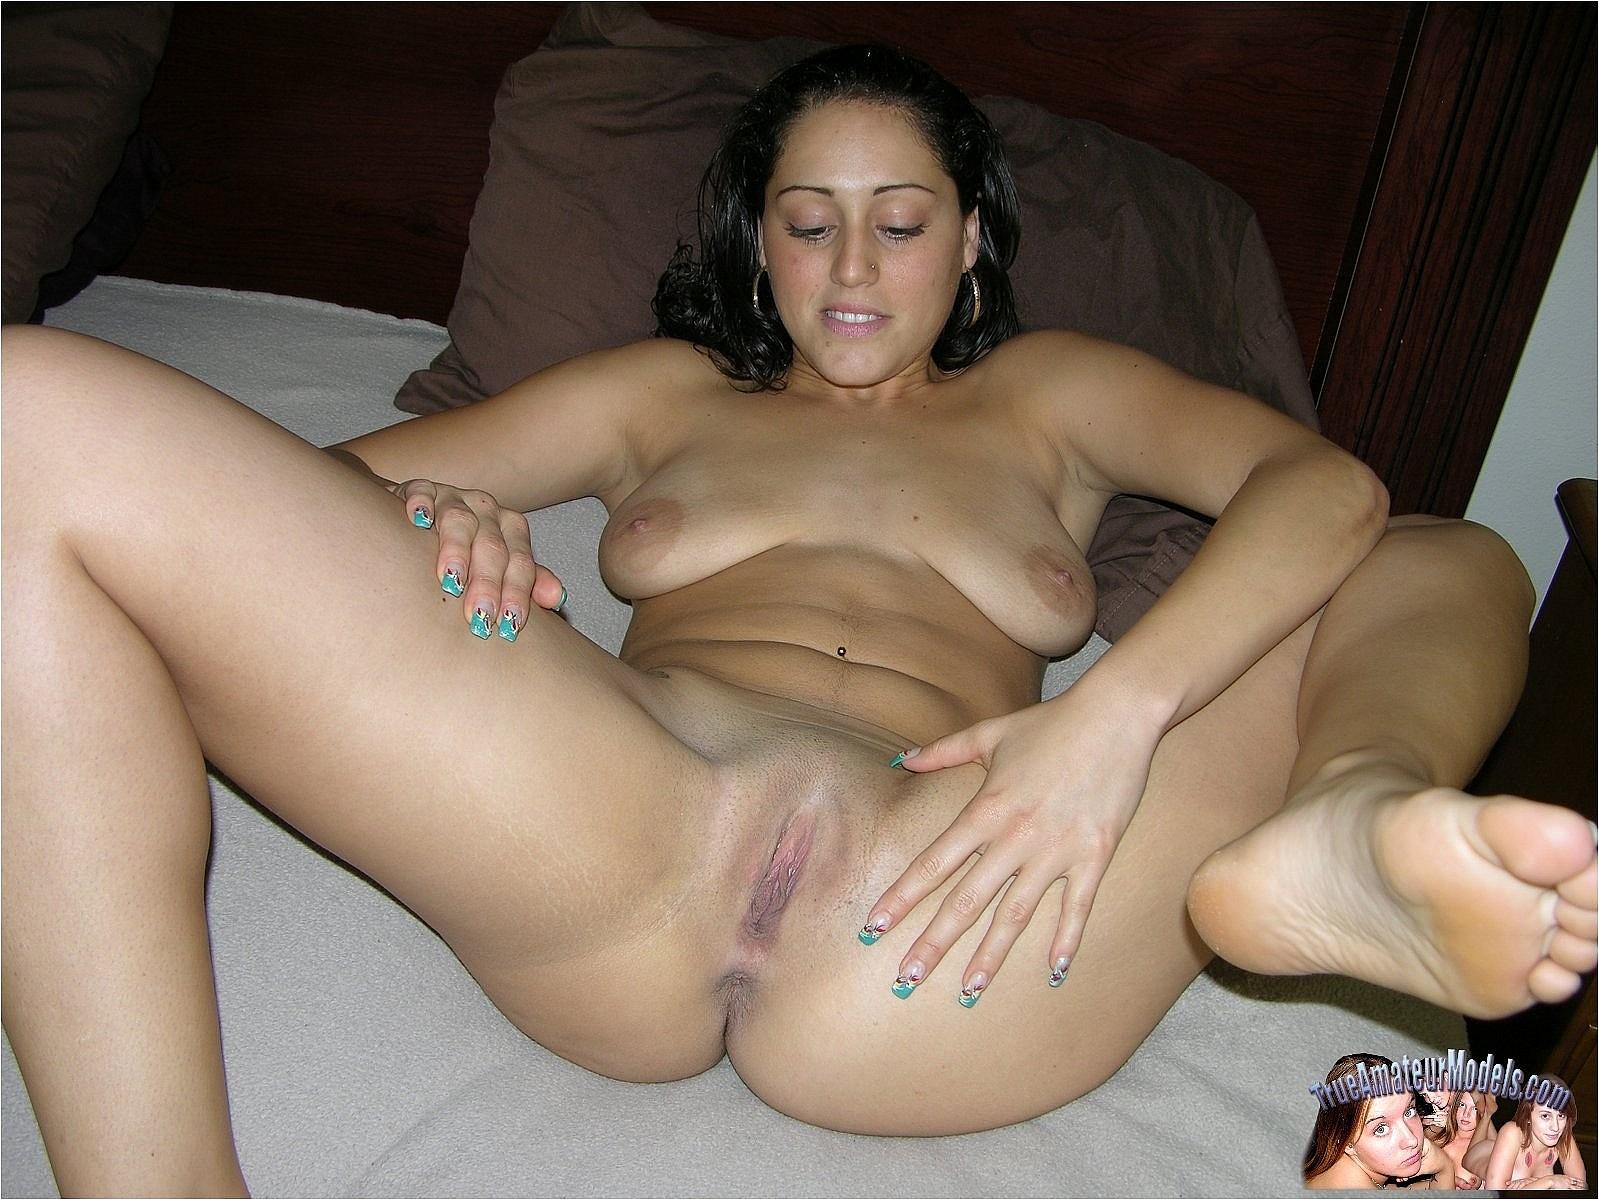 Amateur Italian Women Nude